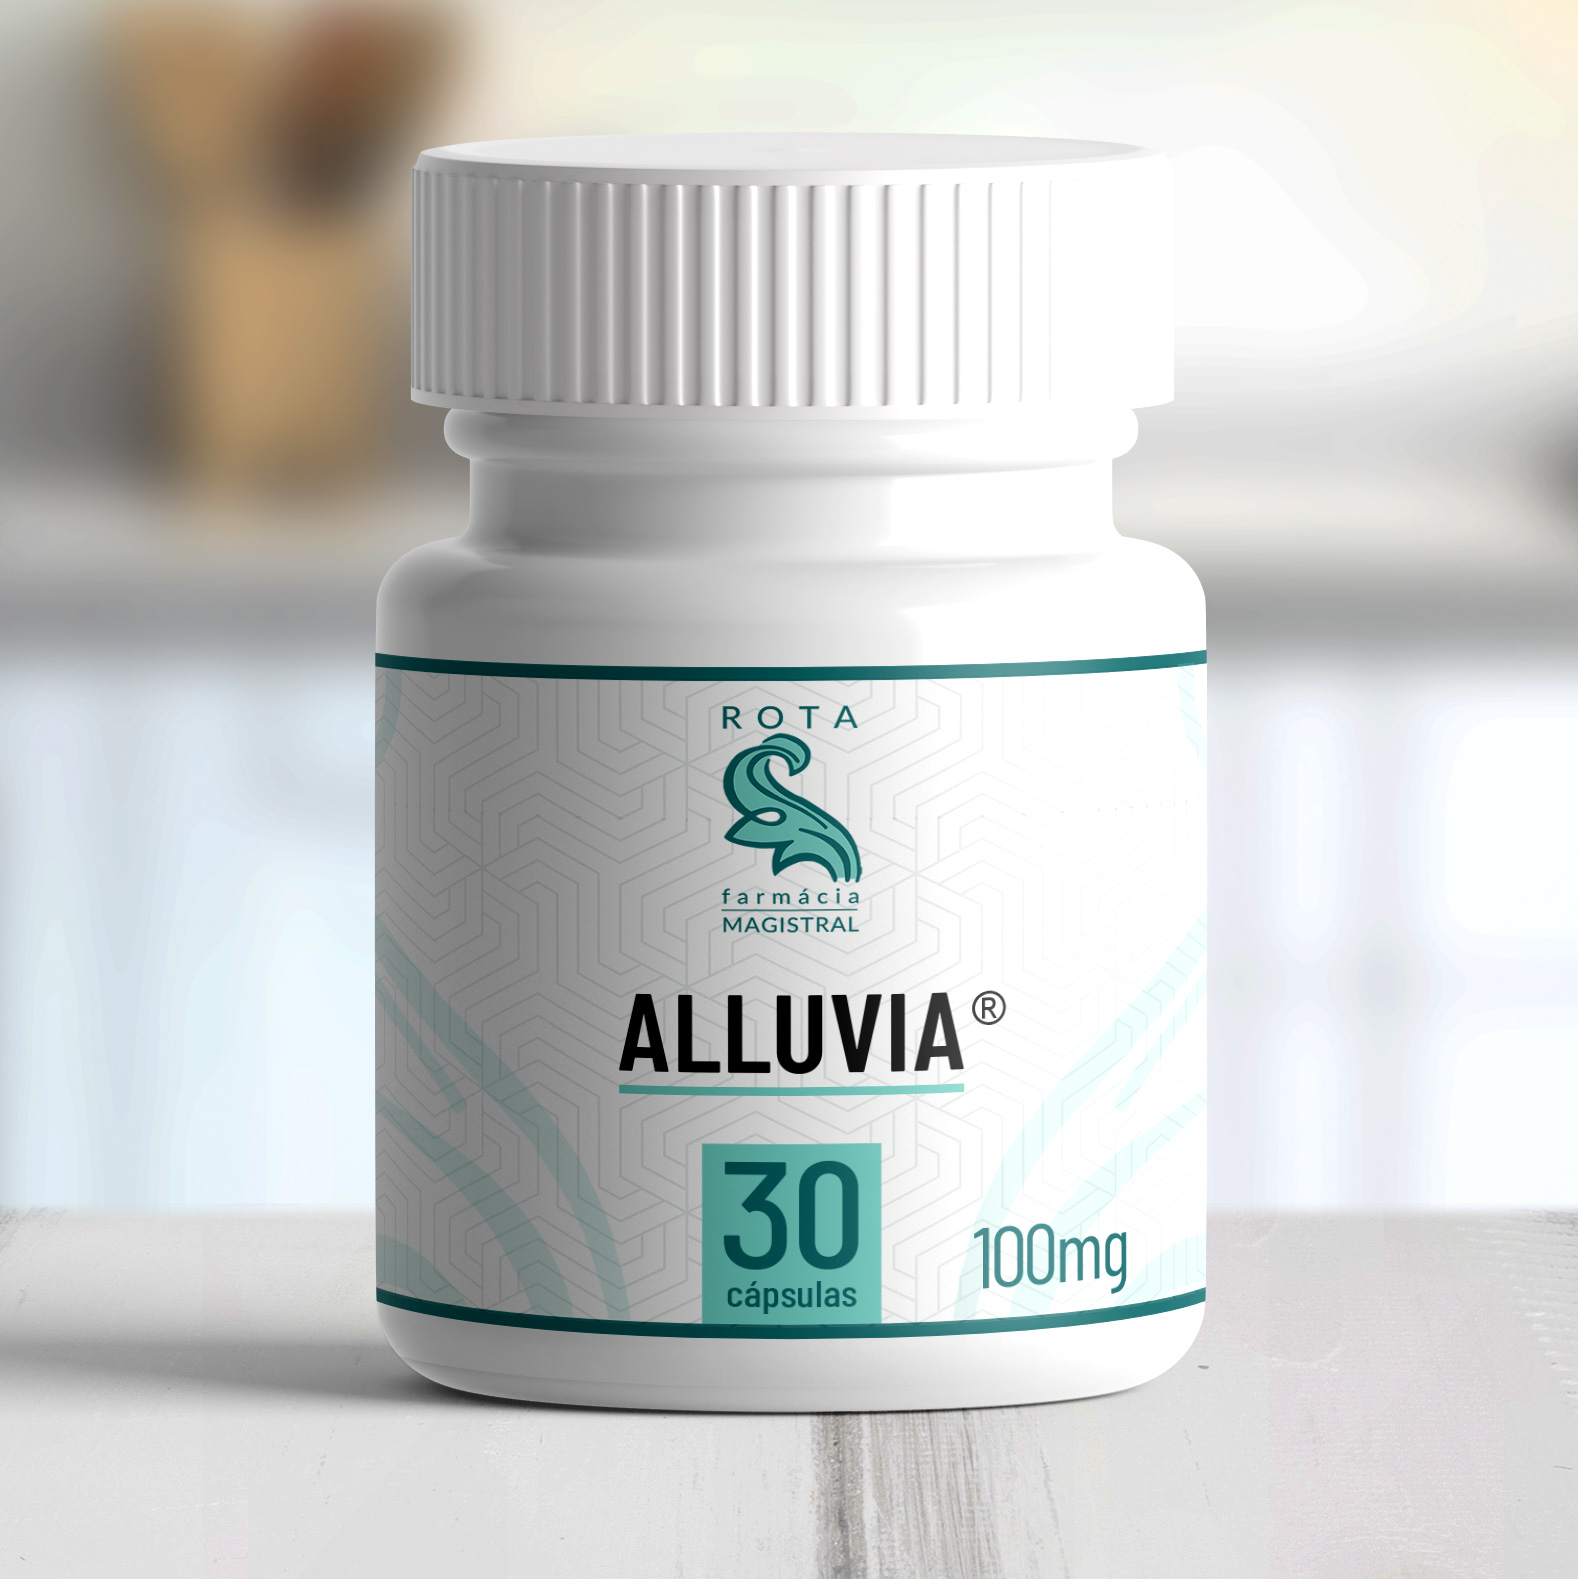 Alluvia ® 100mg 30 cápsulas